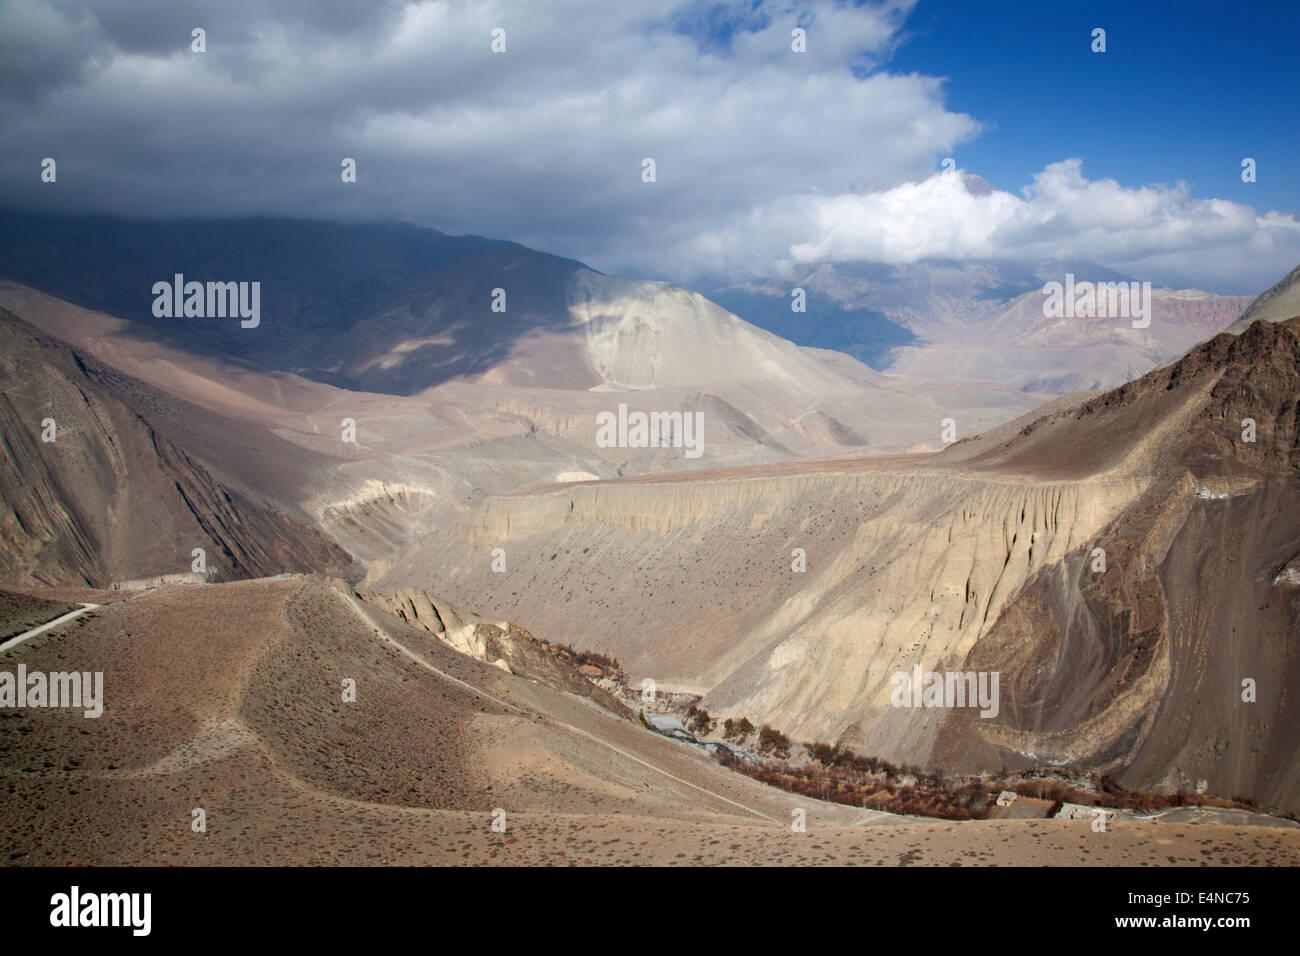 Kagbeni to Muktinath Trek, Annapurna Circuit, Himalayas, Nepal - Stock Image